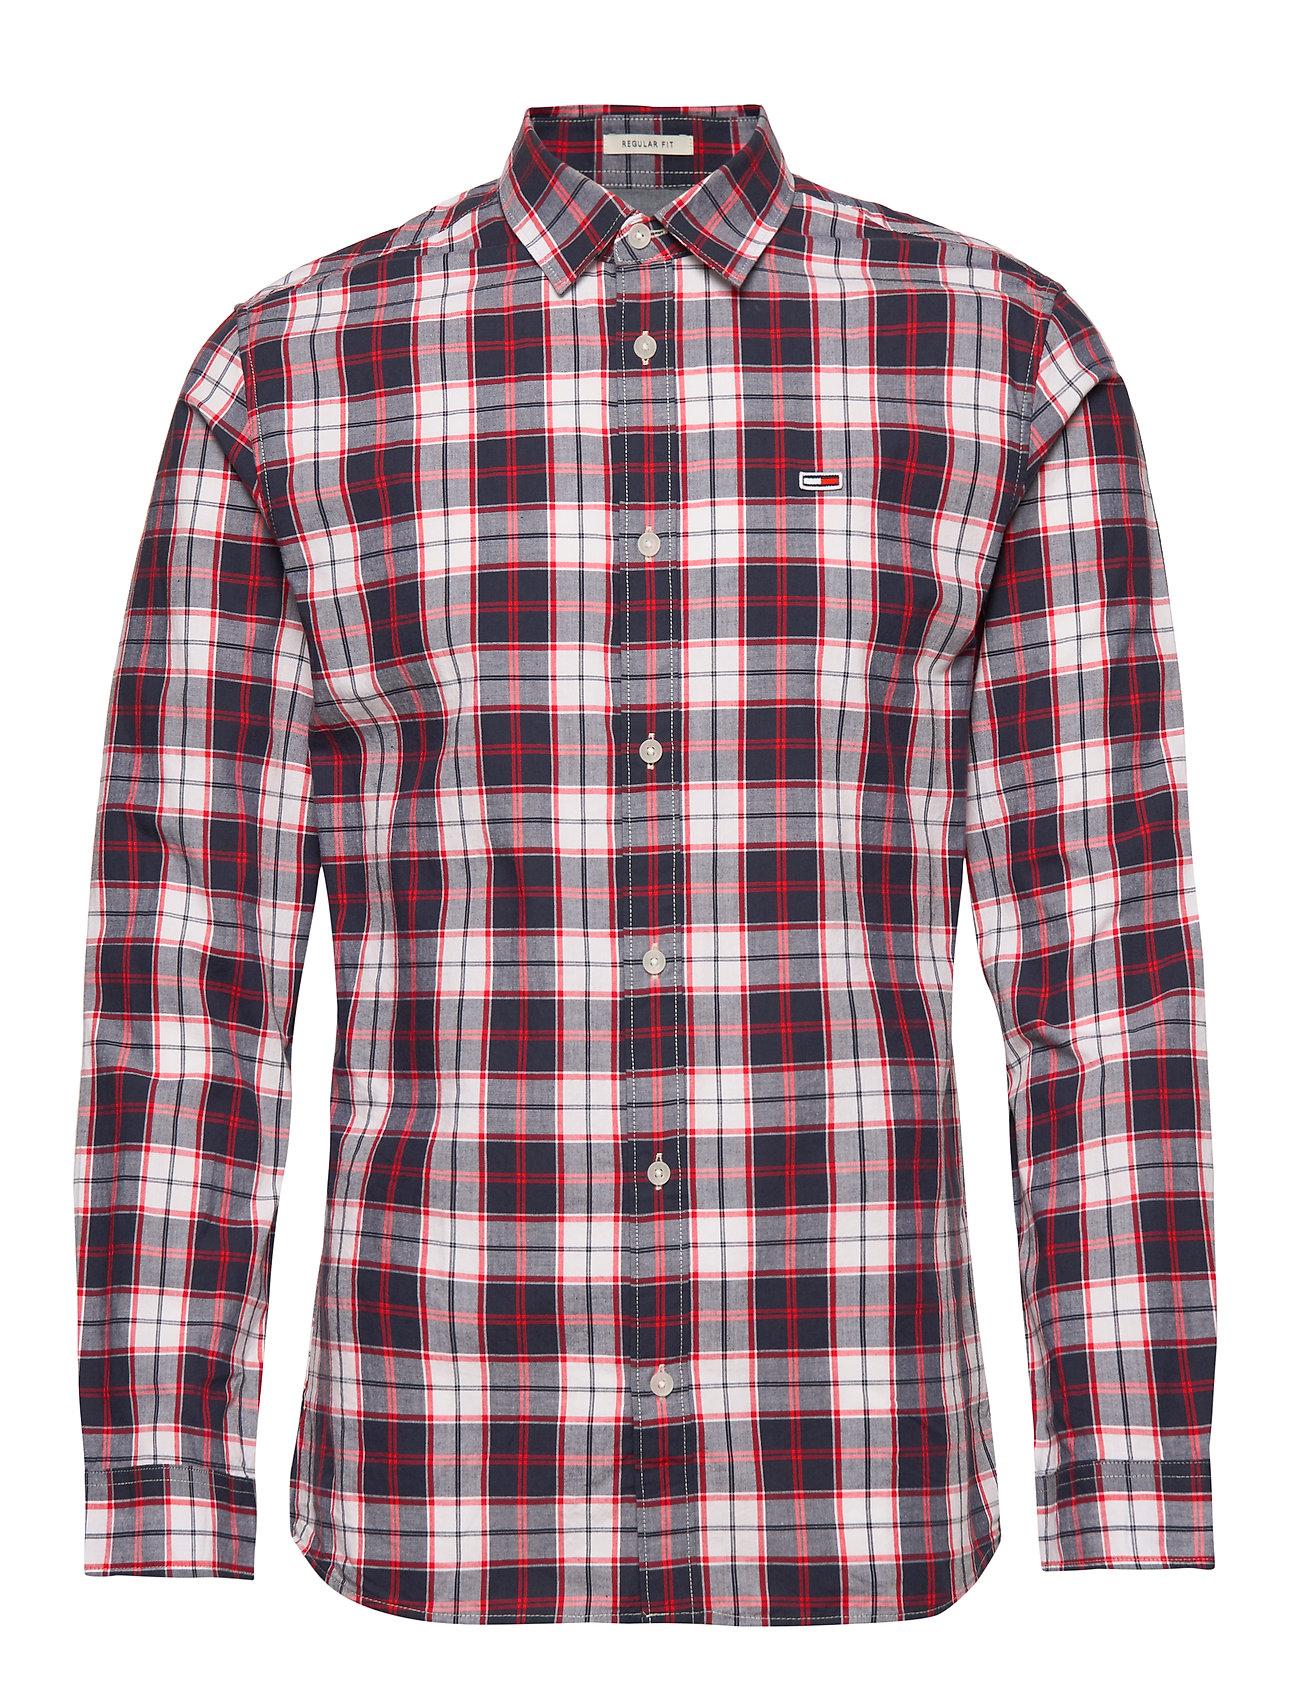 Tommy Jeans TJM POPLIN MULTI CHECK SHIRT - CLASSIC WHITE/MULTI